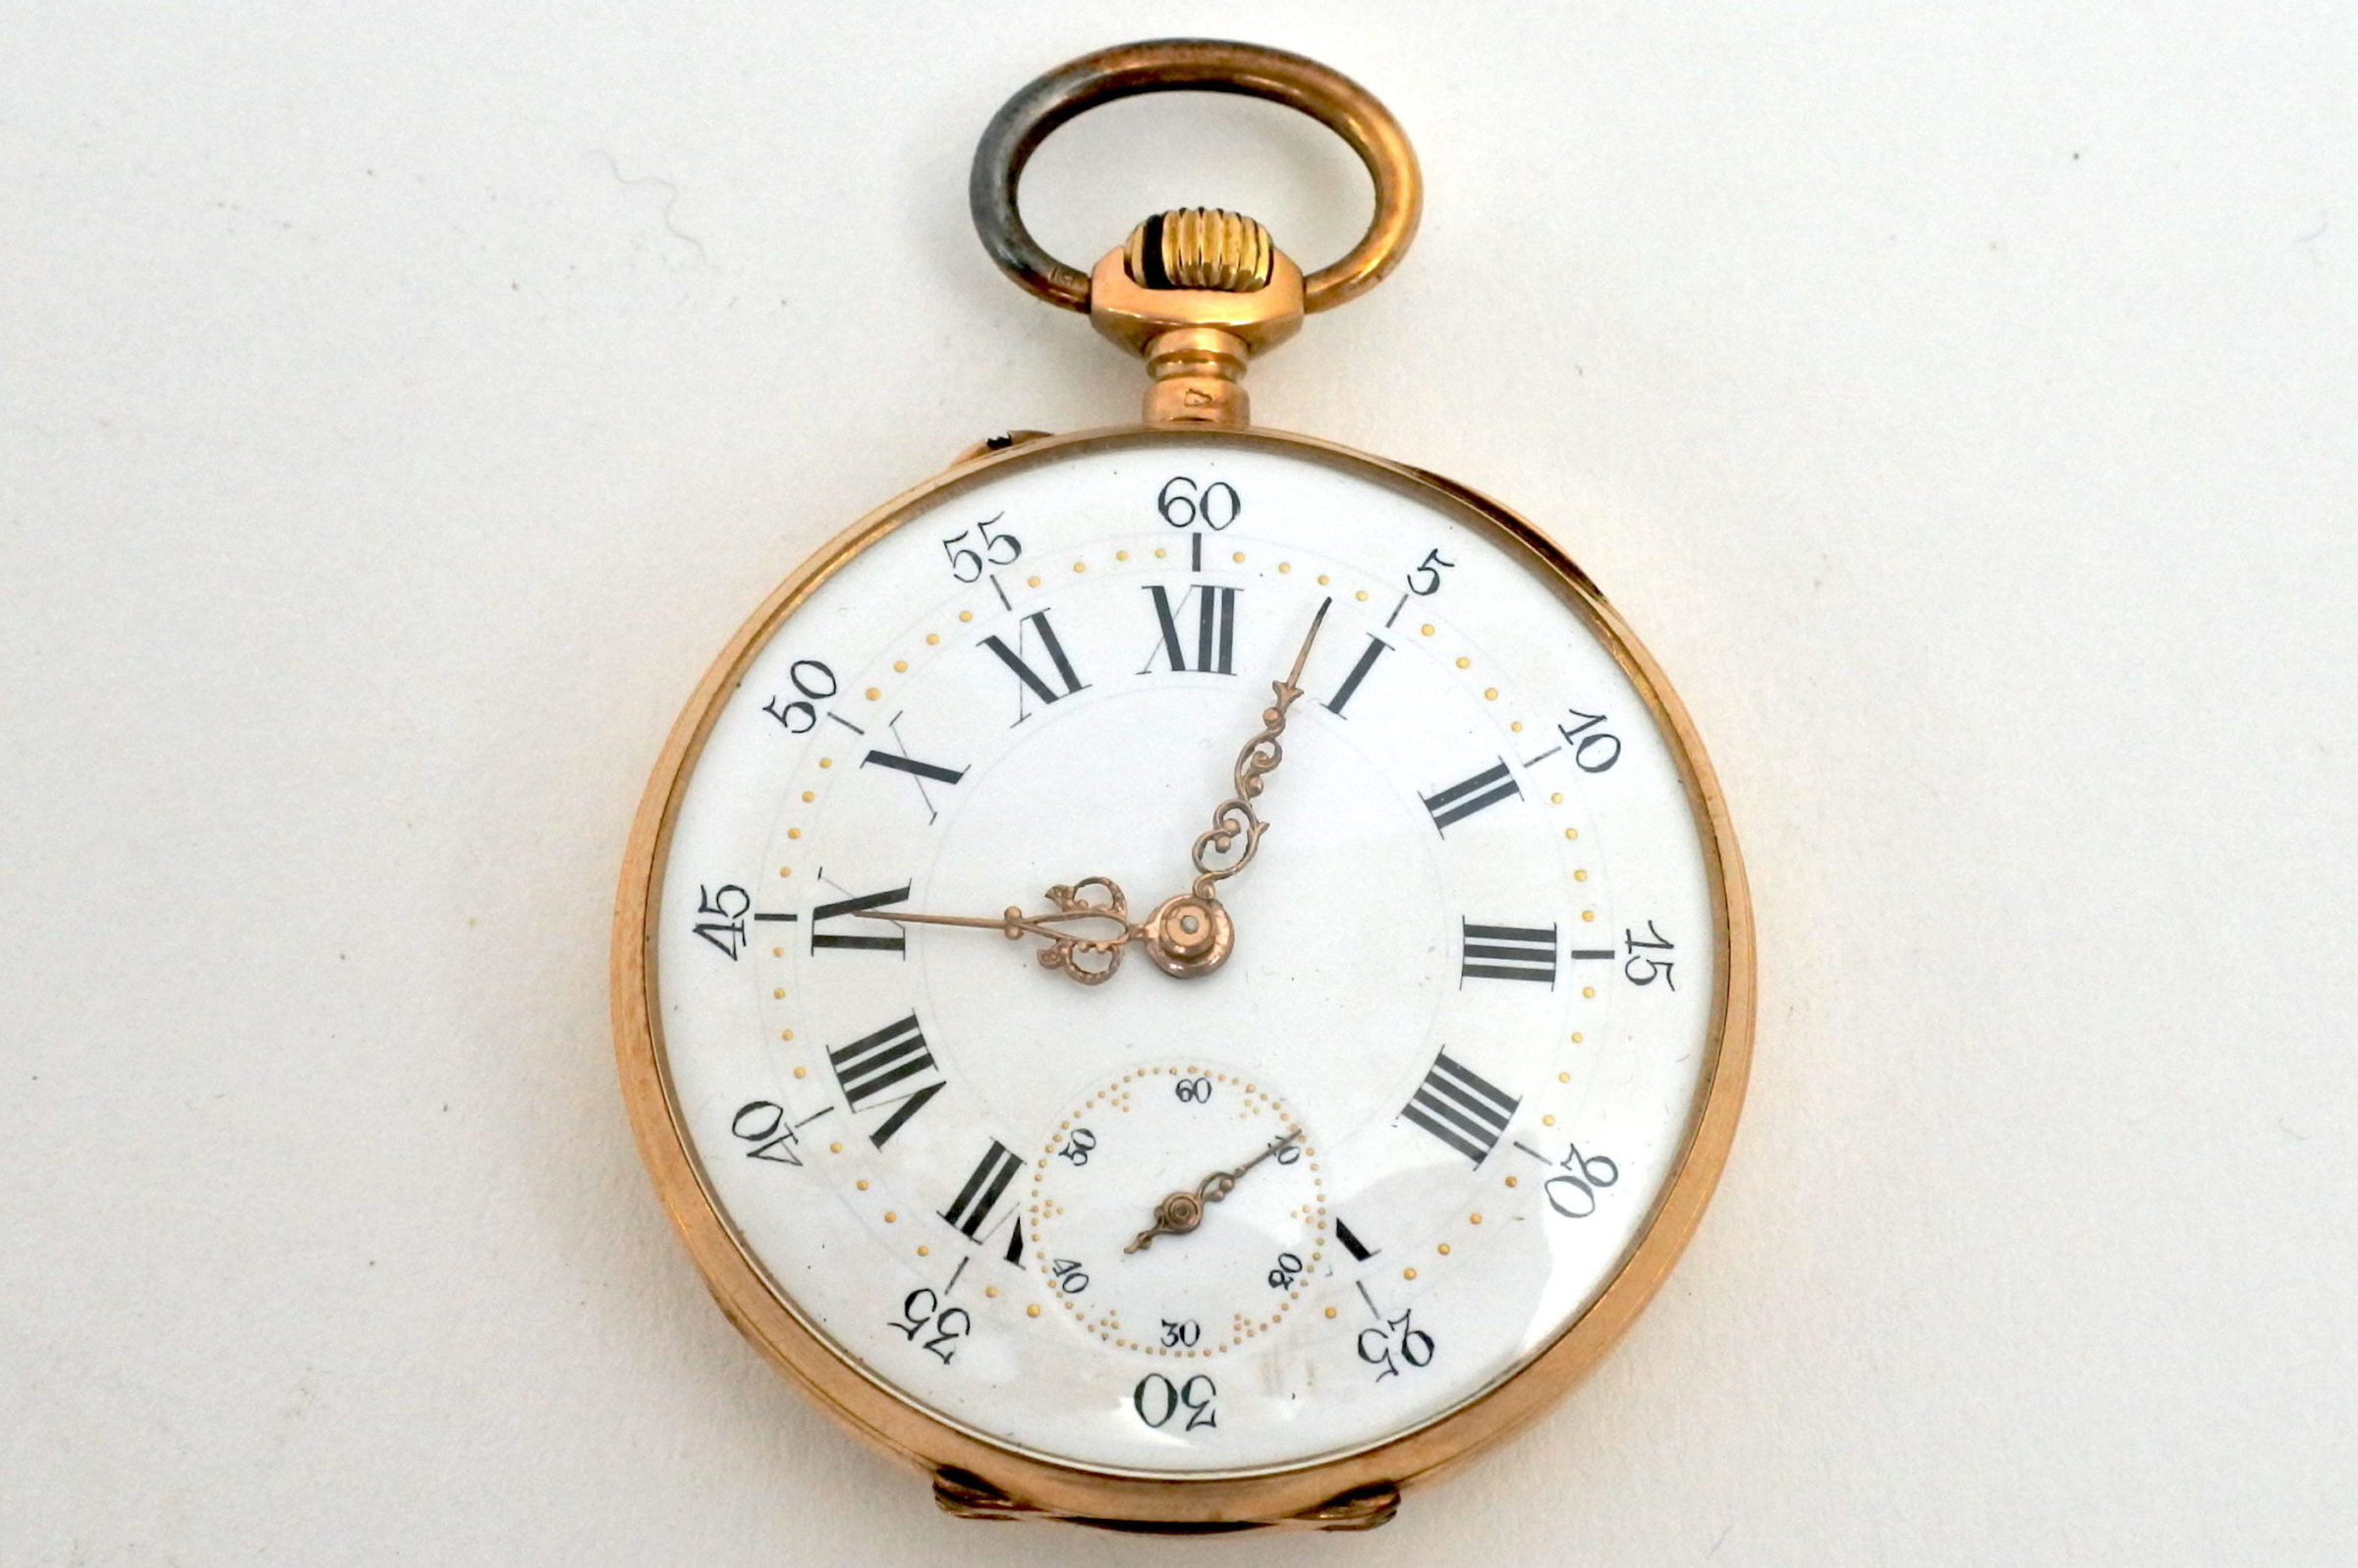 Orologio da tasca in oro - Octave Dupont